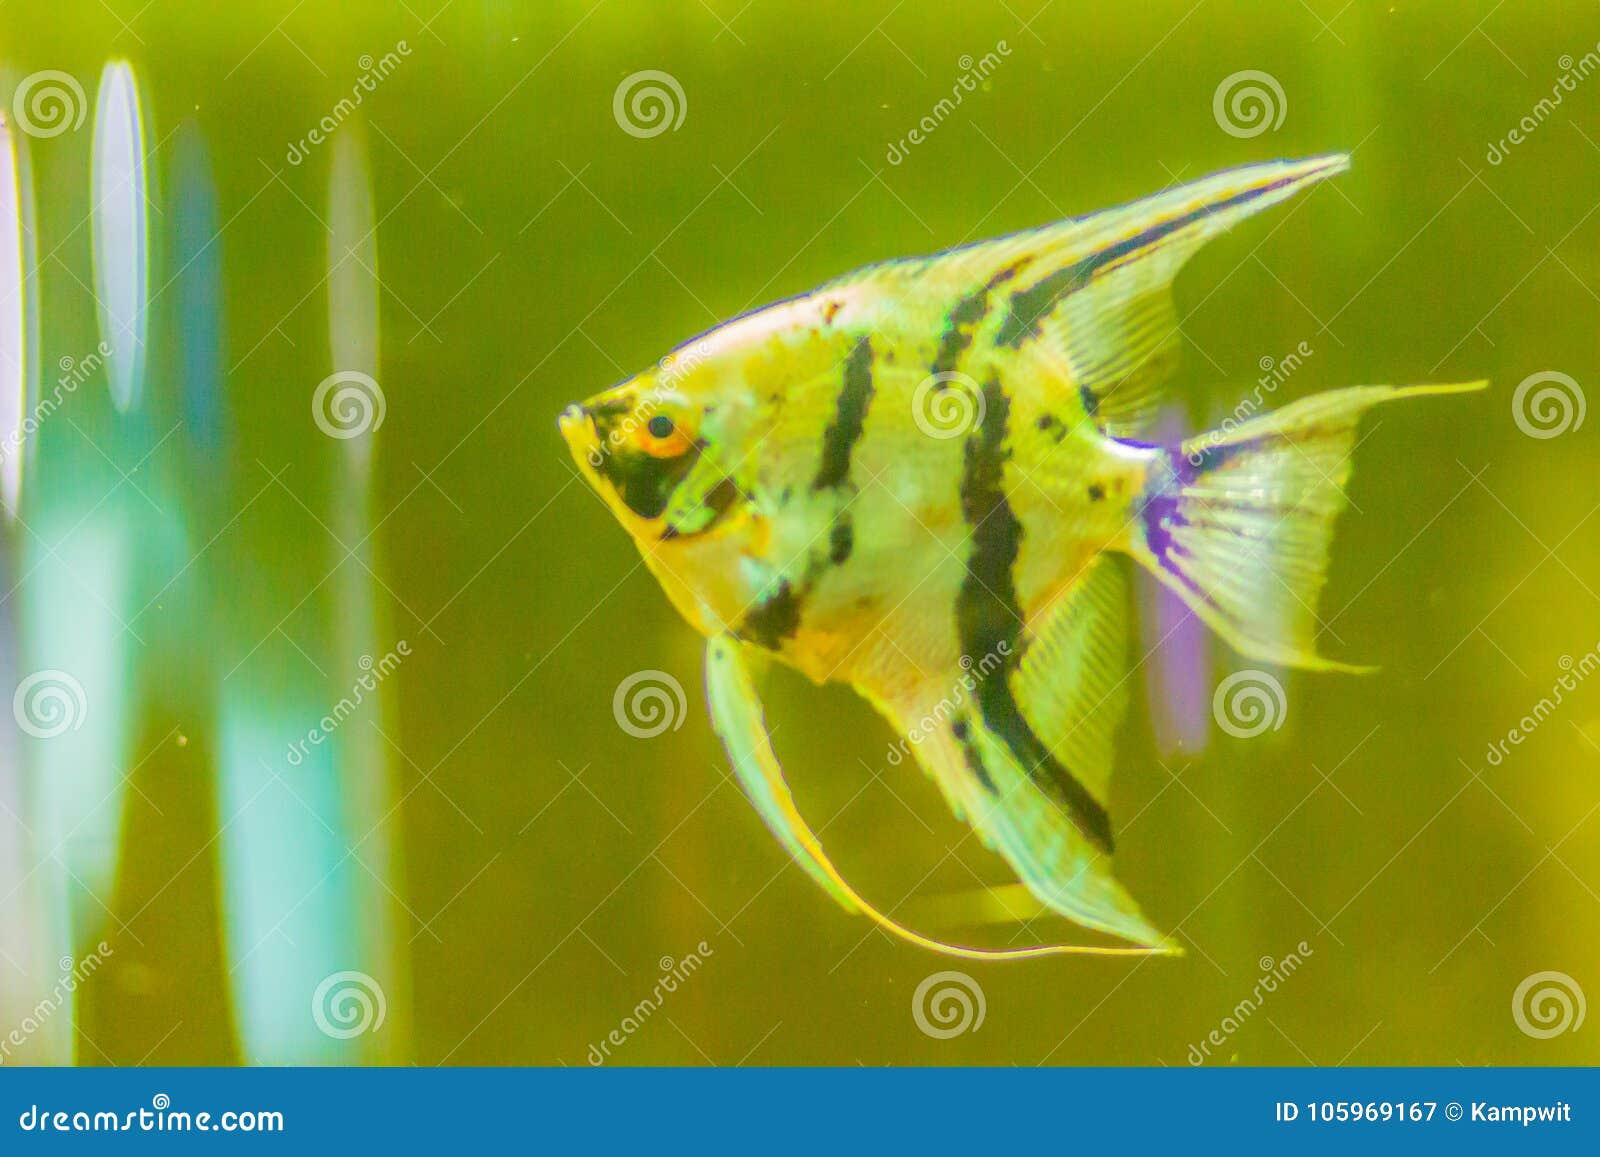 Cute angelfish (Pterophyllum) fish, a small genus of freshwater